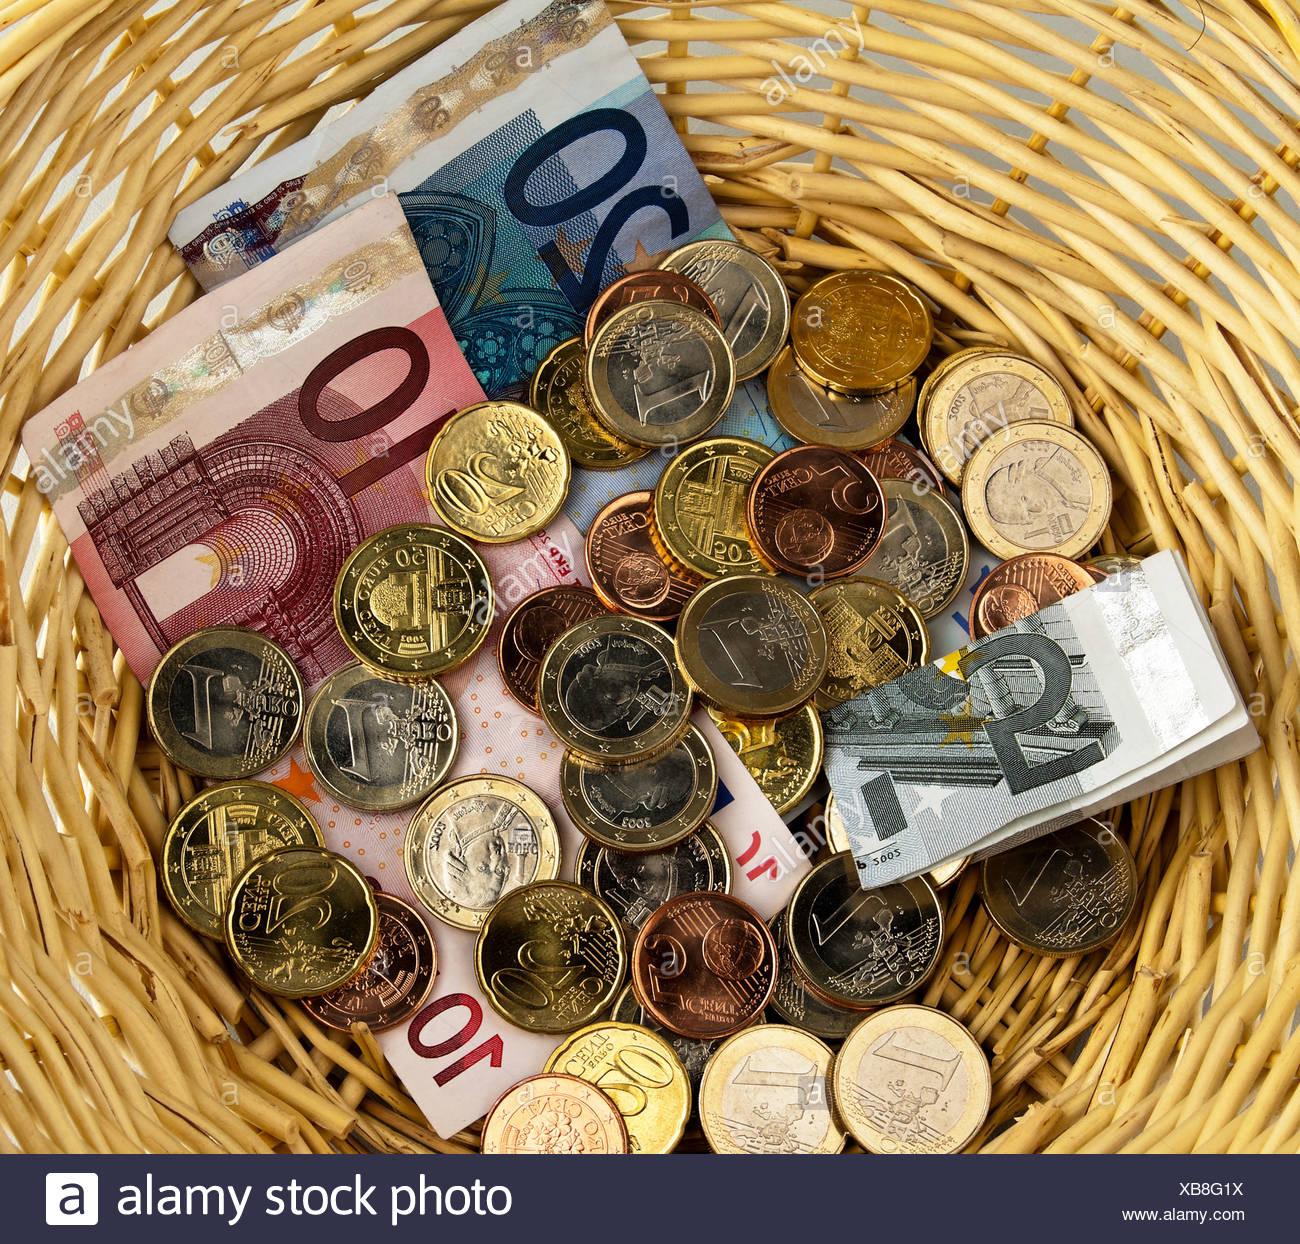 Donation - Stock Image